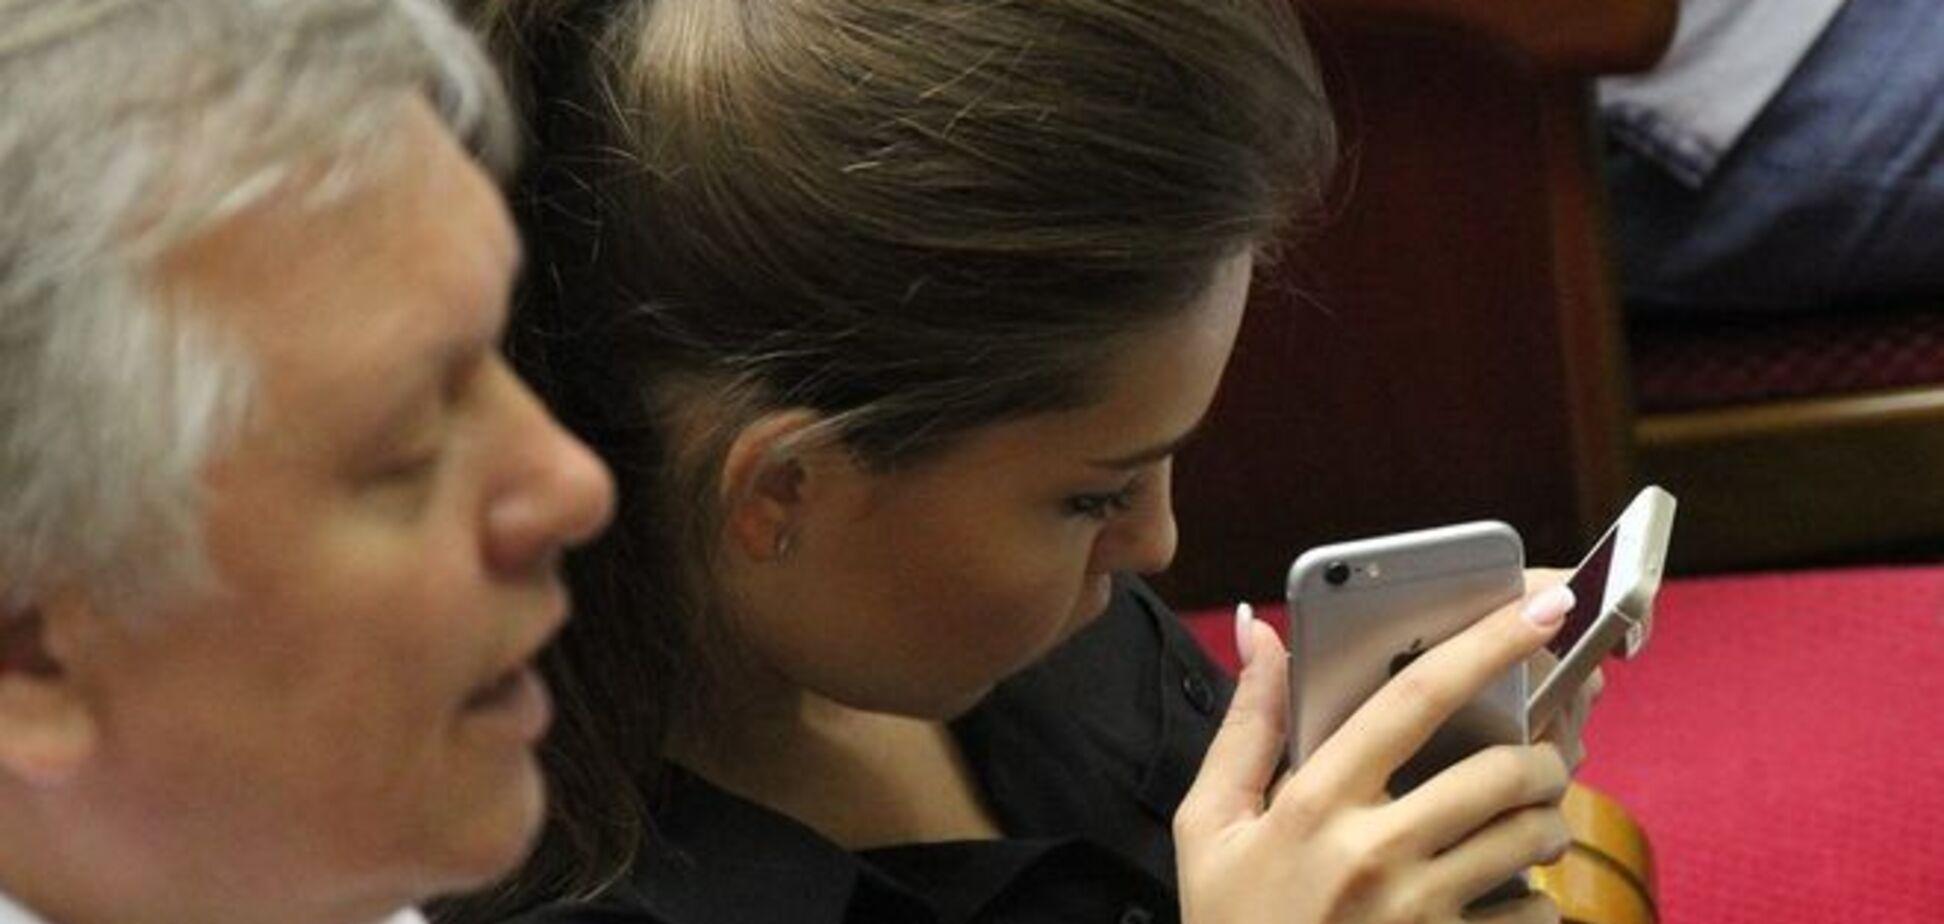 Гламурная депутат Кошелева скучала в Раде, глядя сразу в два айфона: фотофакт